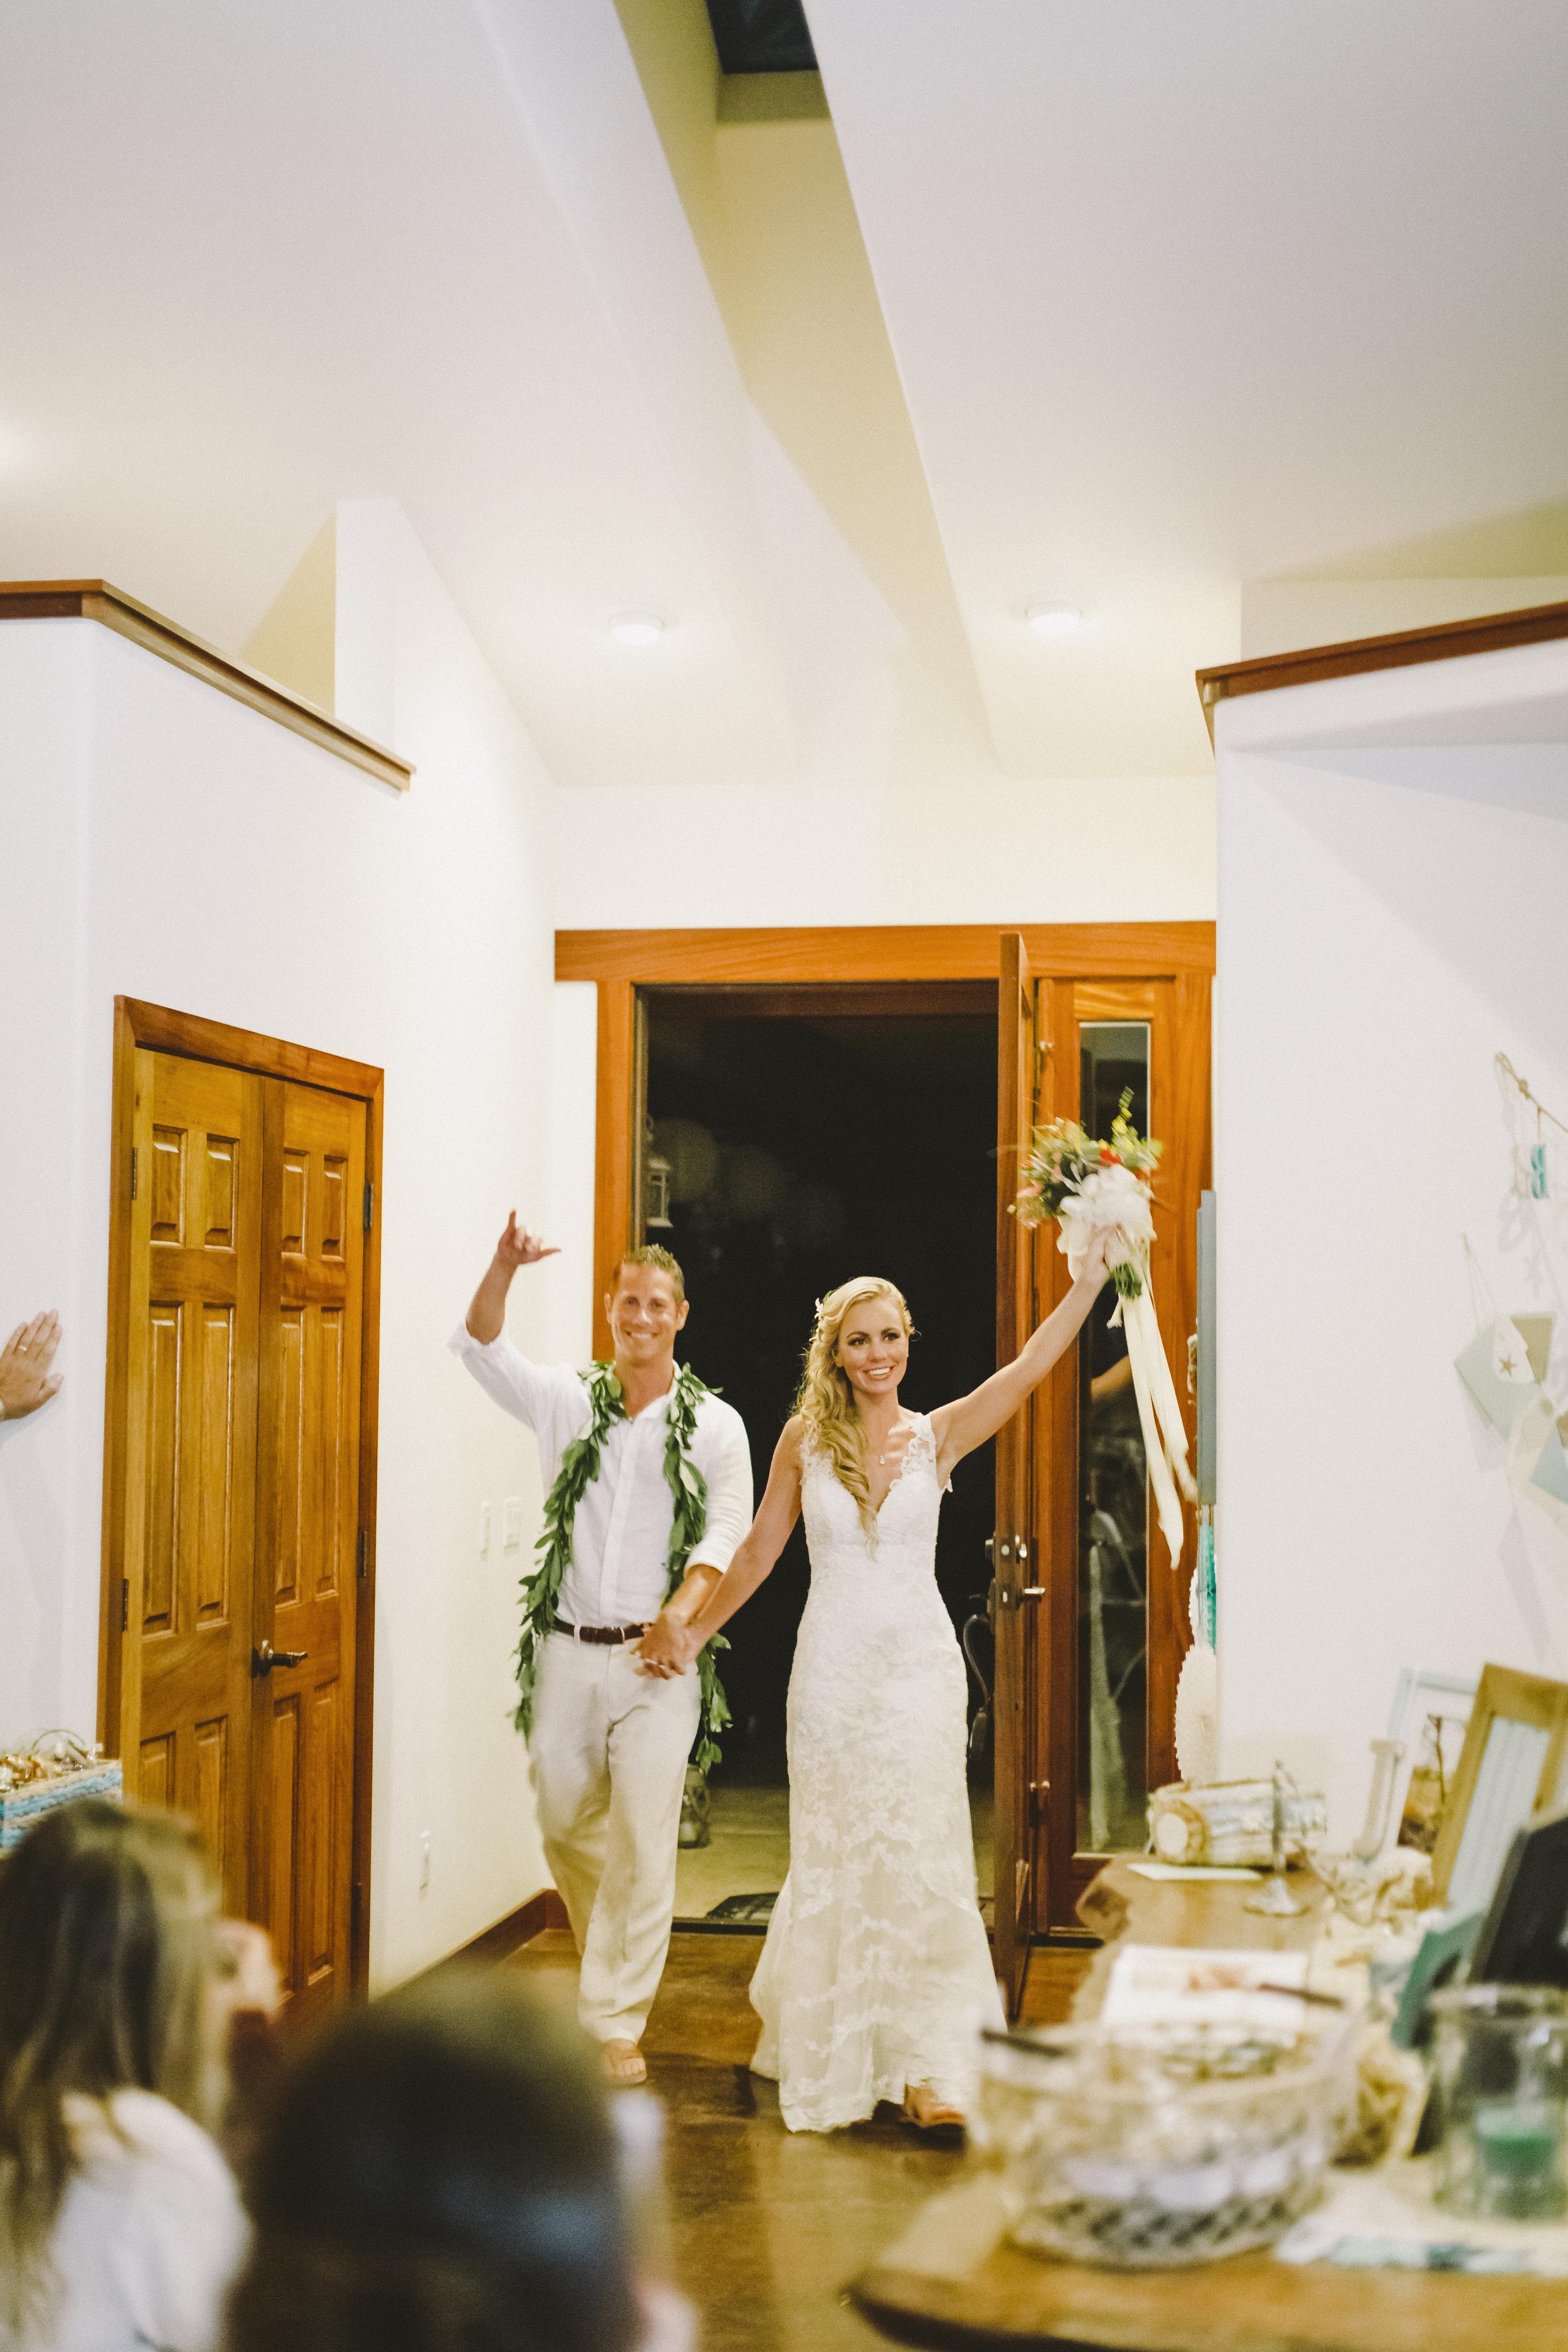 angie-diaz-photography-hawaii-wedding-photographer-kelli-jay-119.jpg